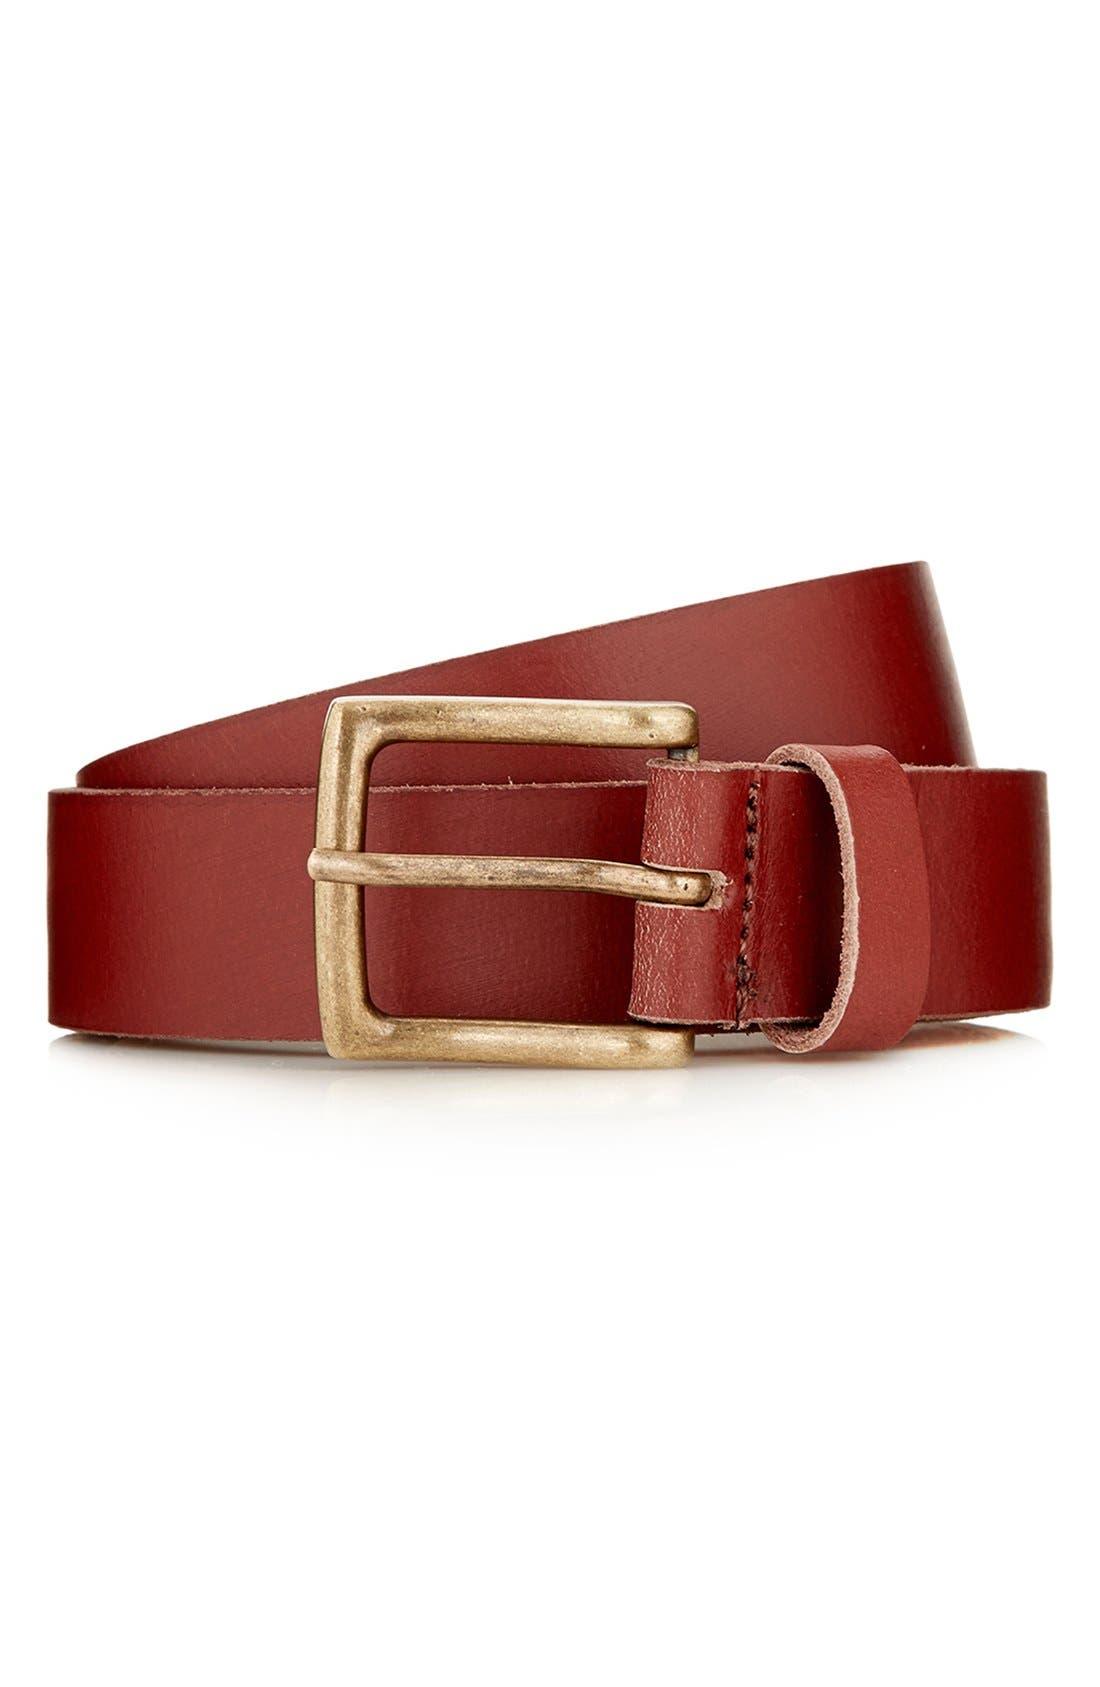 Alternate Image 1 Selected - Topman Brown Leather Belt